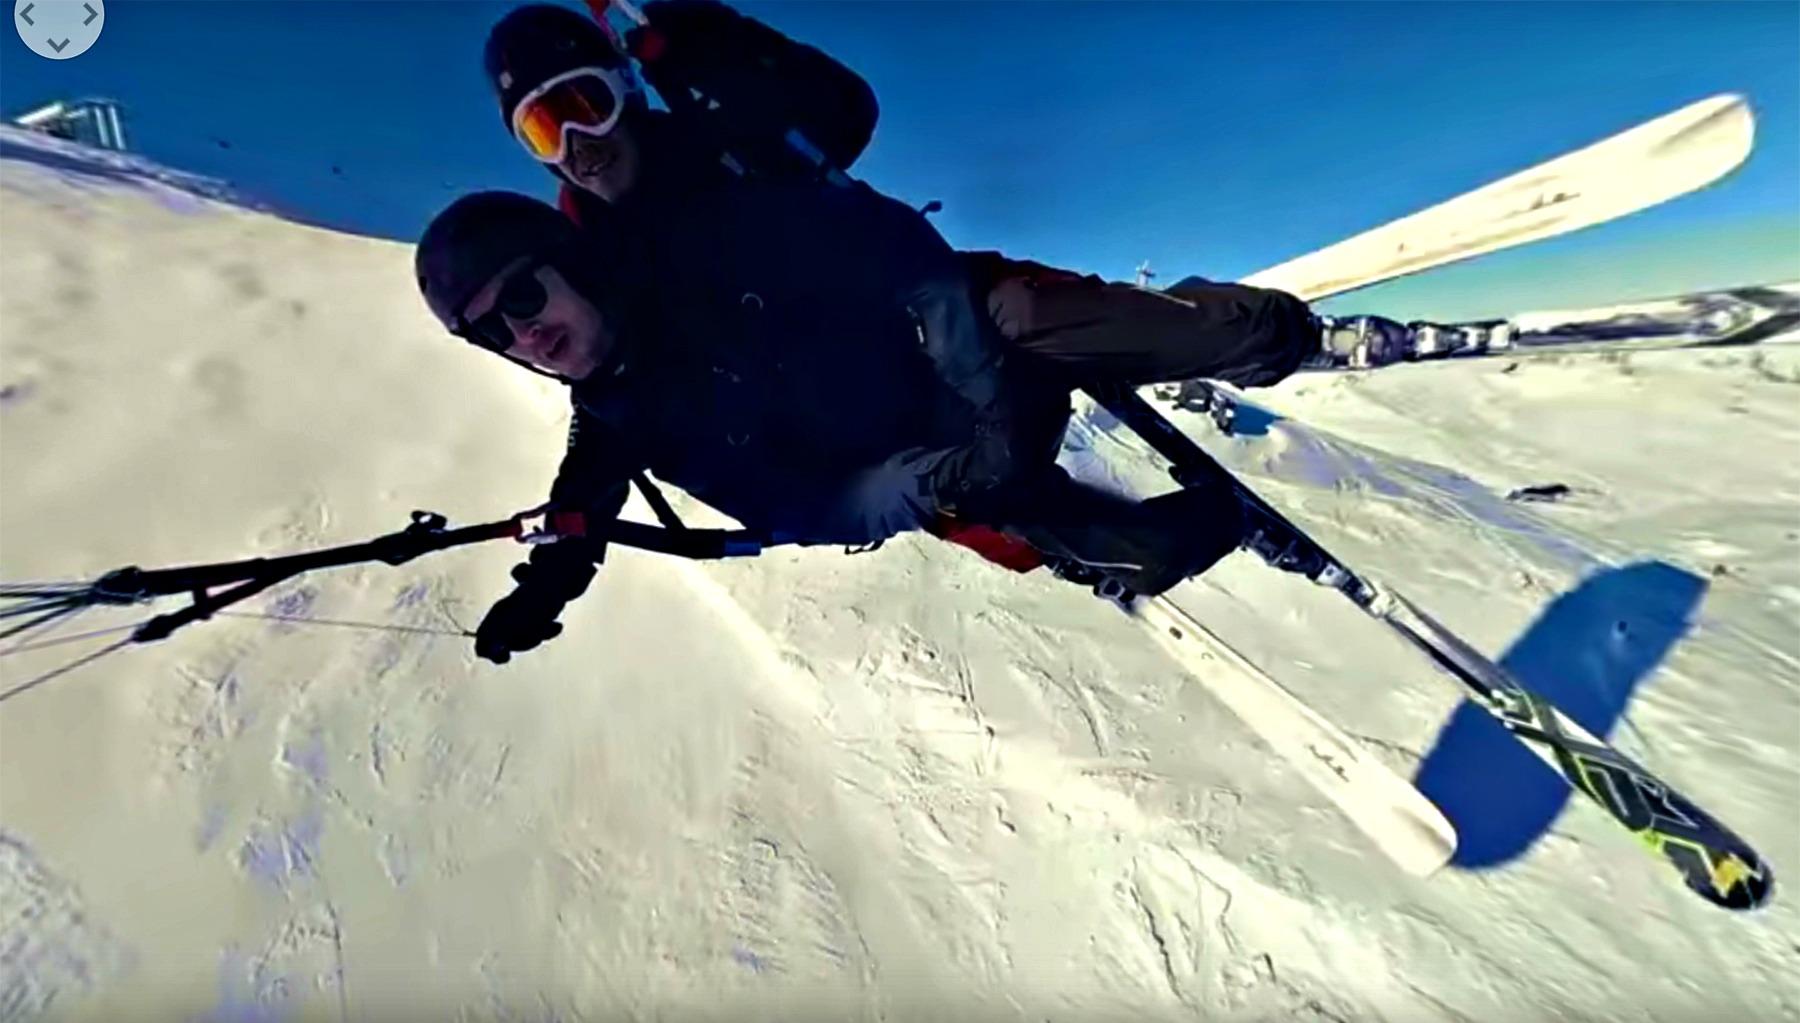 Ed Miller goes speed flying on the slopes of Val Thorens, France